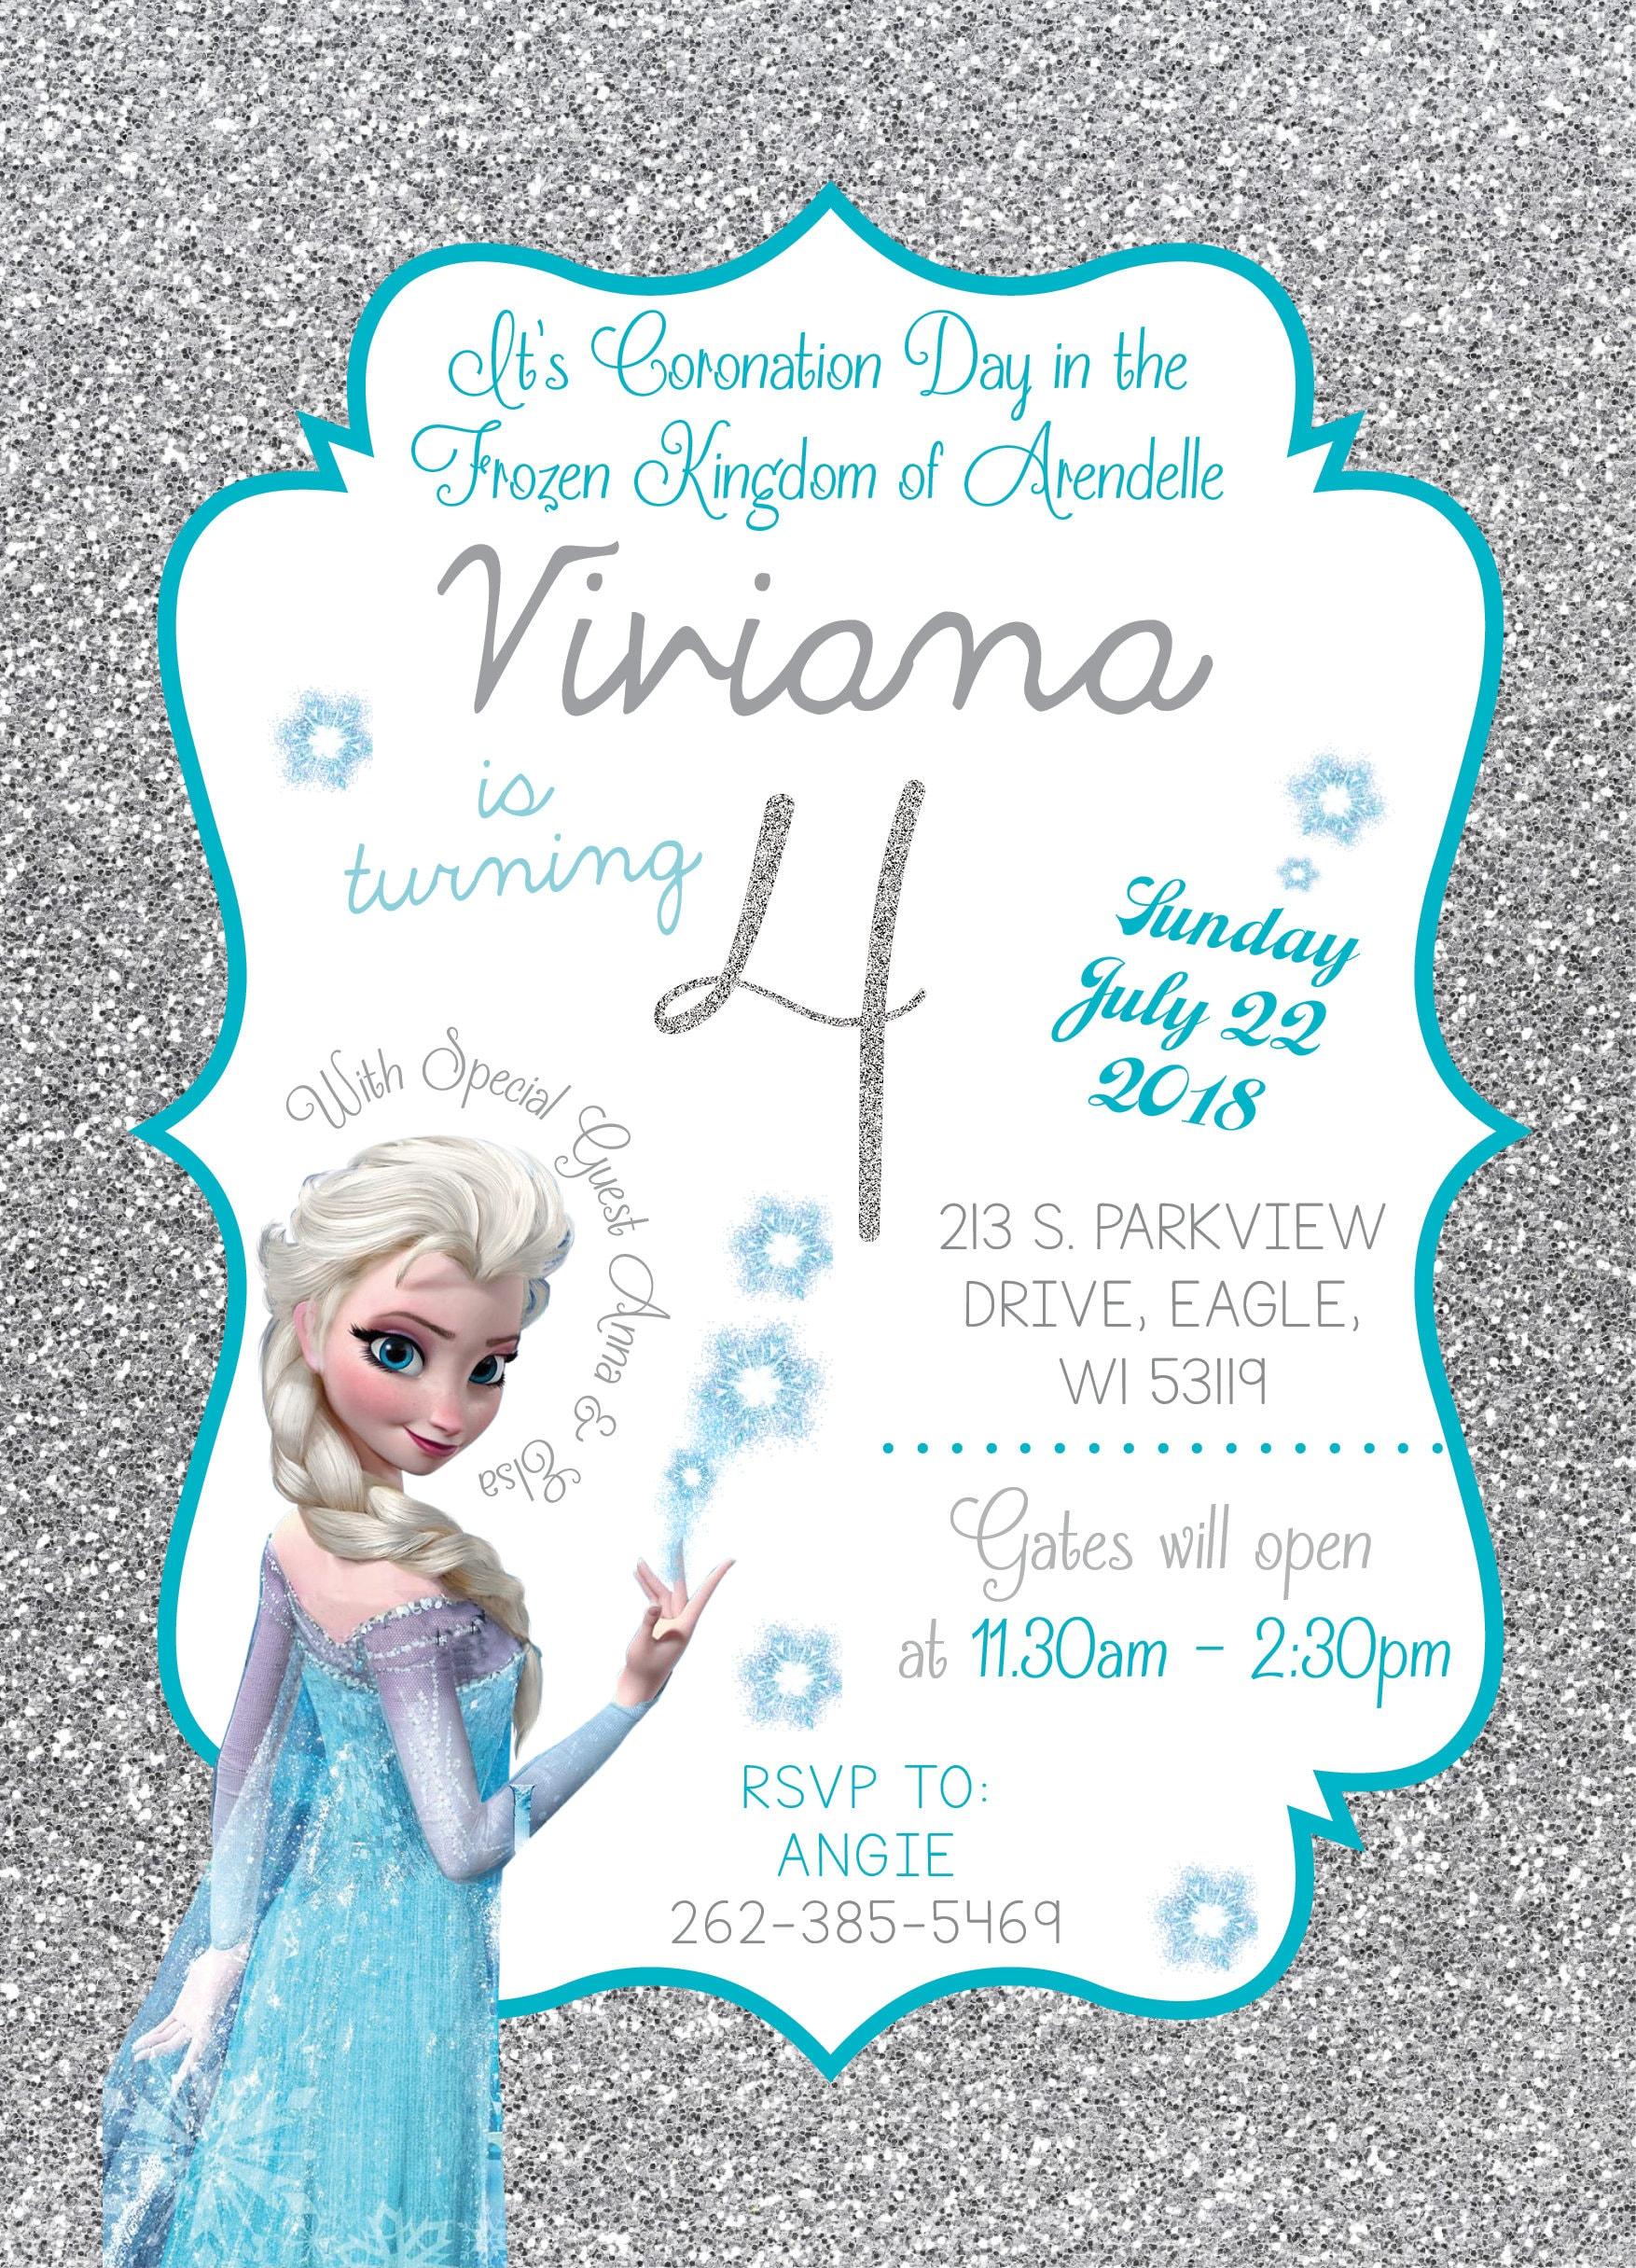 Disney Frozen birthday party invitation Queen Elsa Anna   Etsy